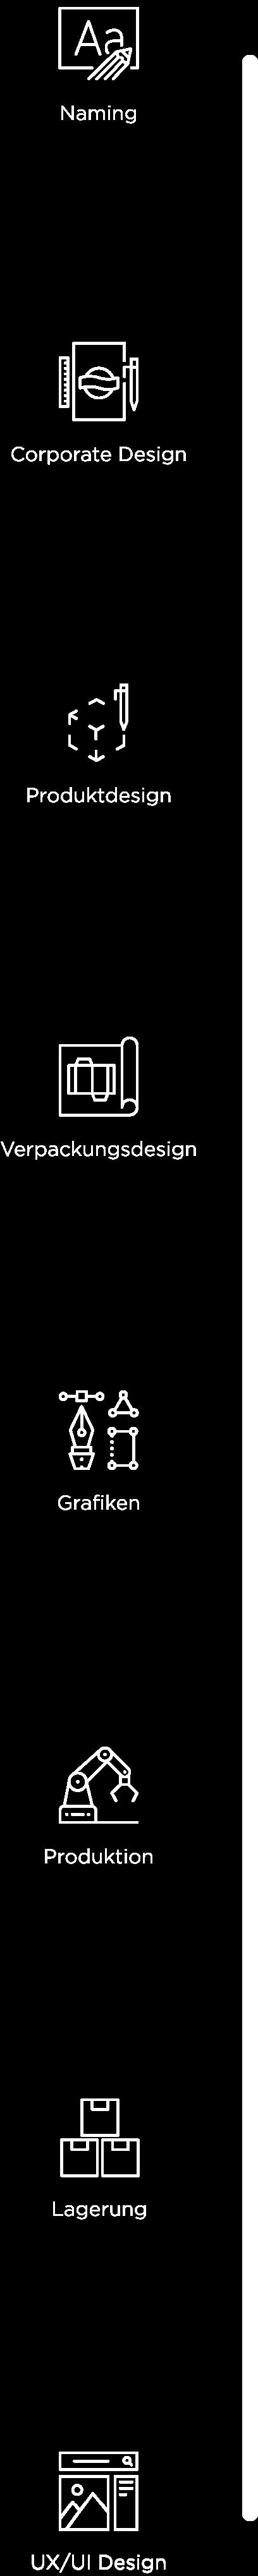 Icon-Timeline-1